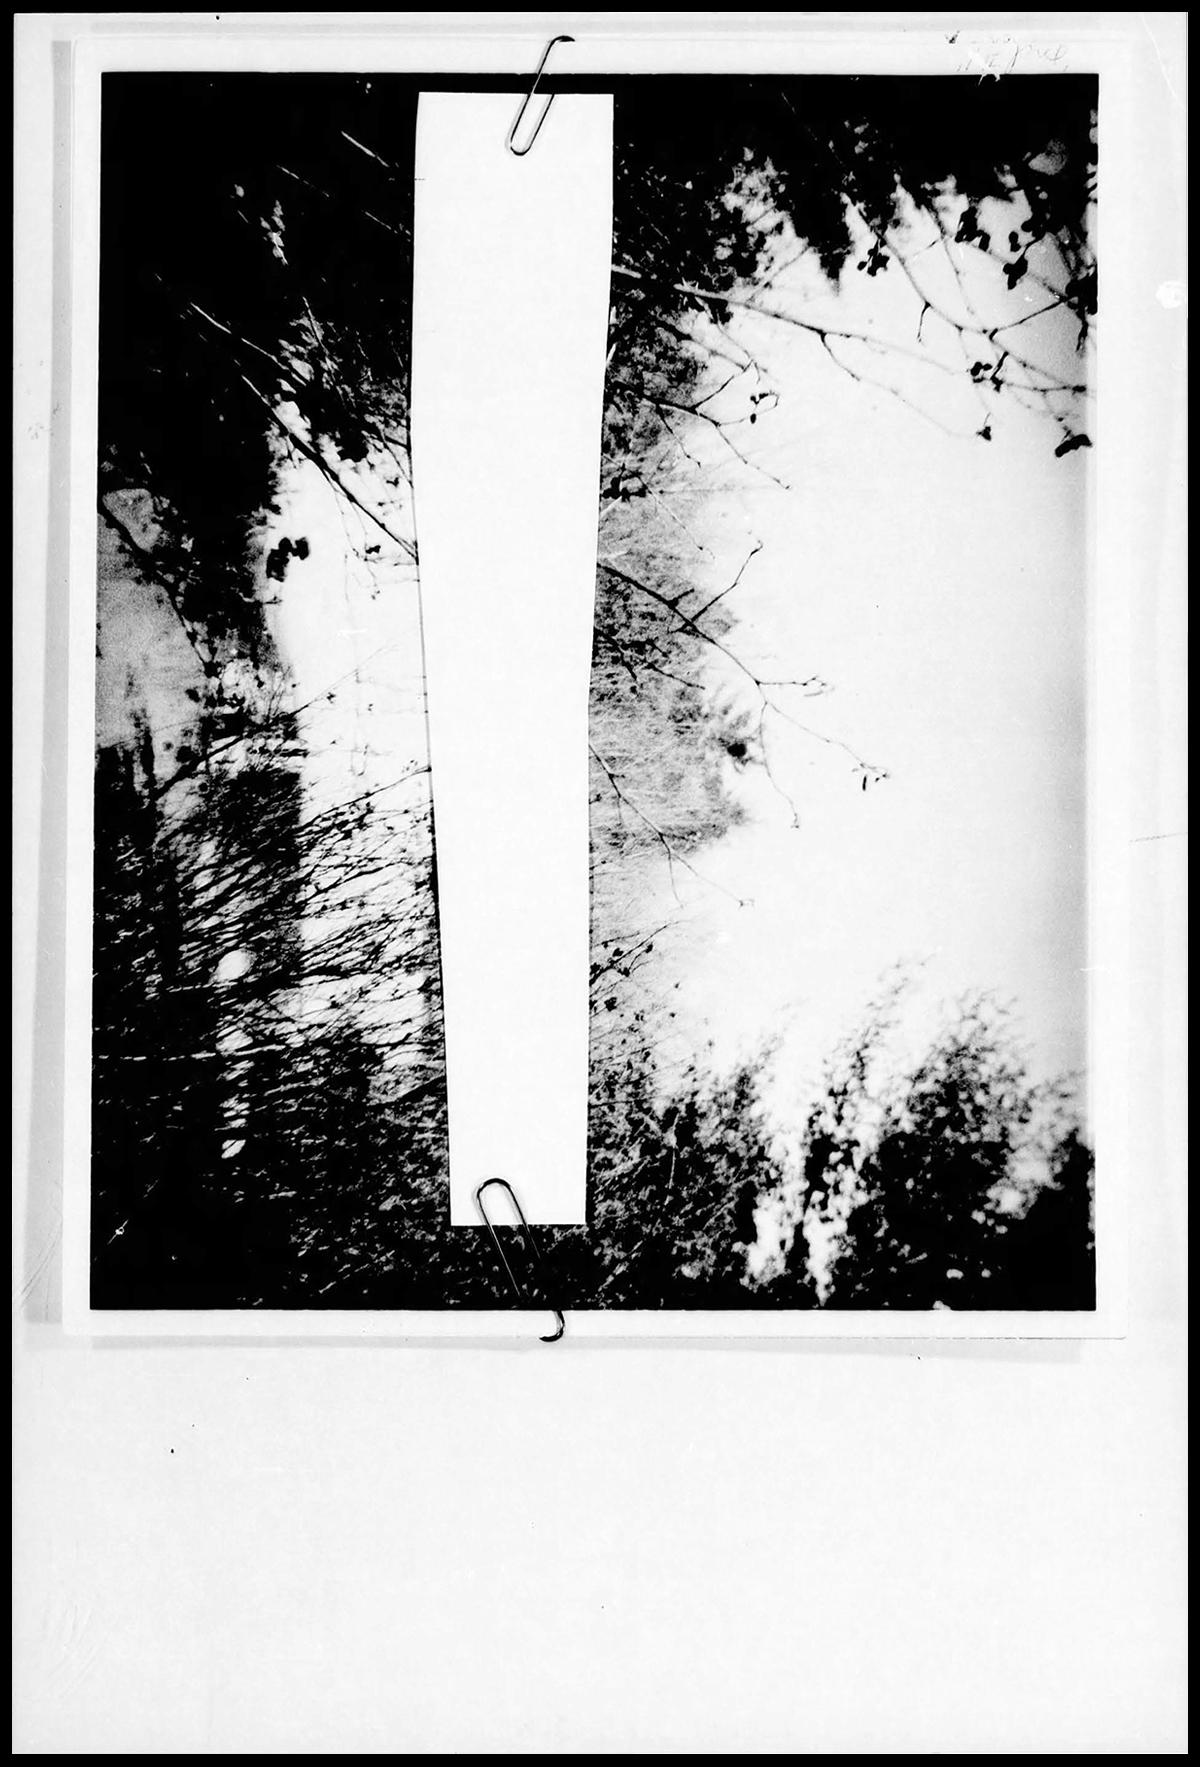 File 4628: Kitery Pt., Maine / East Nassau, New York - February 14, 1957